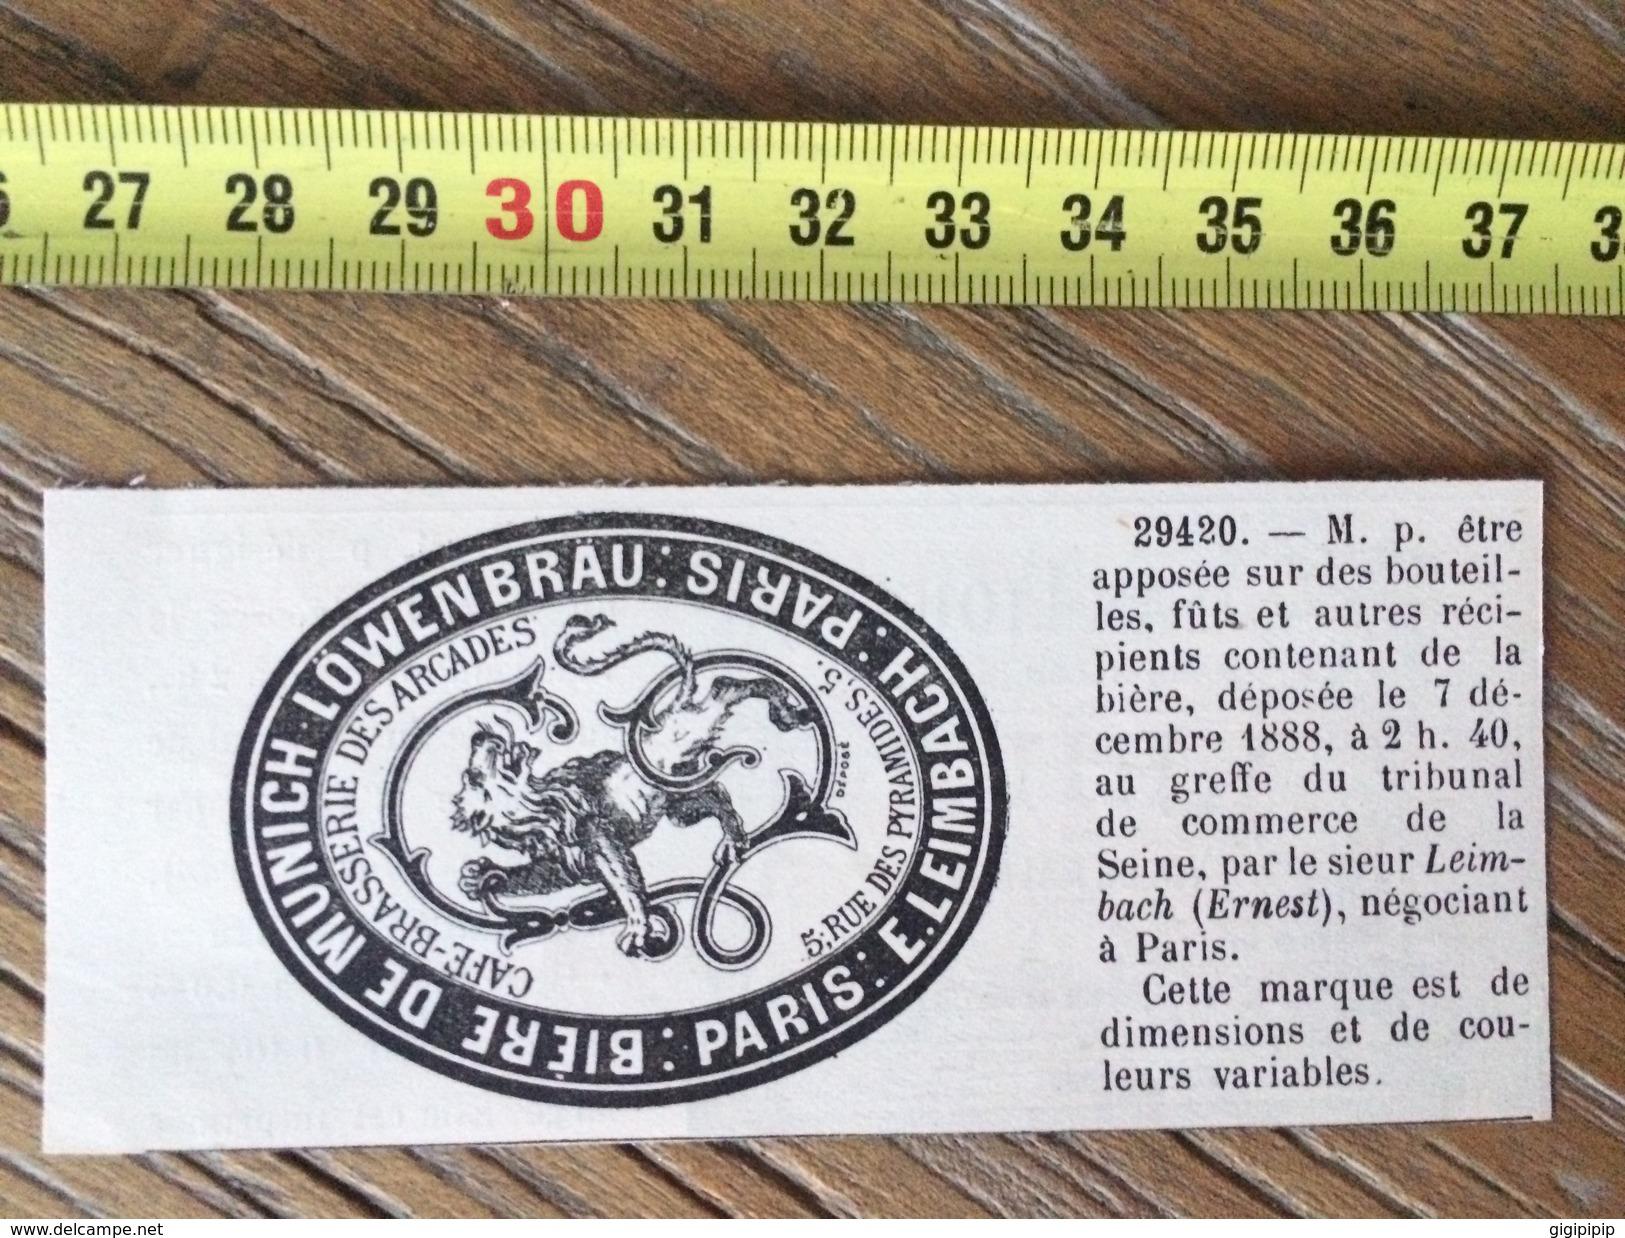 MARQUE DEPOSEE 1888 BIERE BRASSERIE DE MUNICH MUNCHEN LOWENBRAU LEIMBACH ERNEST - Vieux Papiers